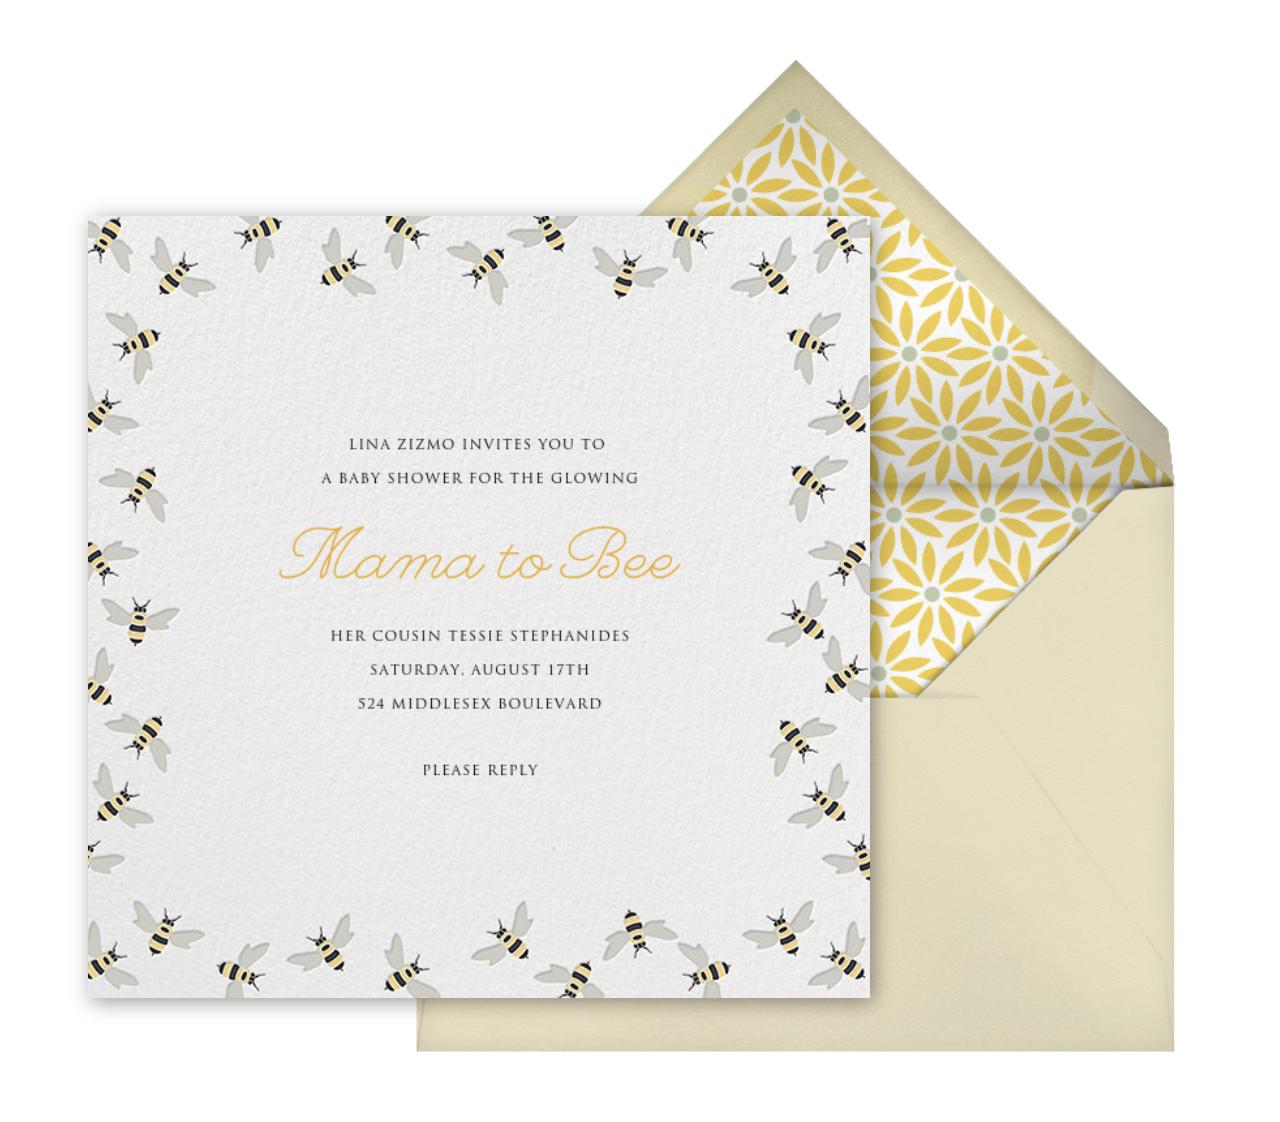 https://www.paperlesspost.com/cards?q=bee&card=23550